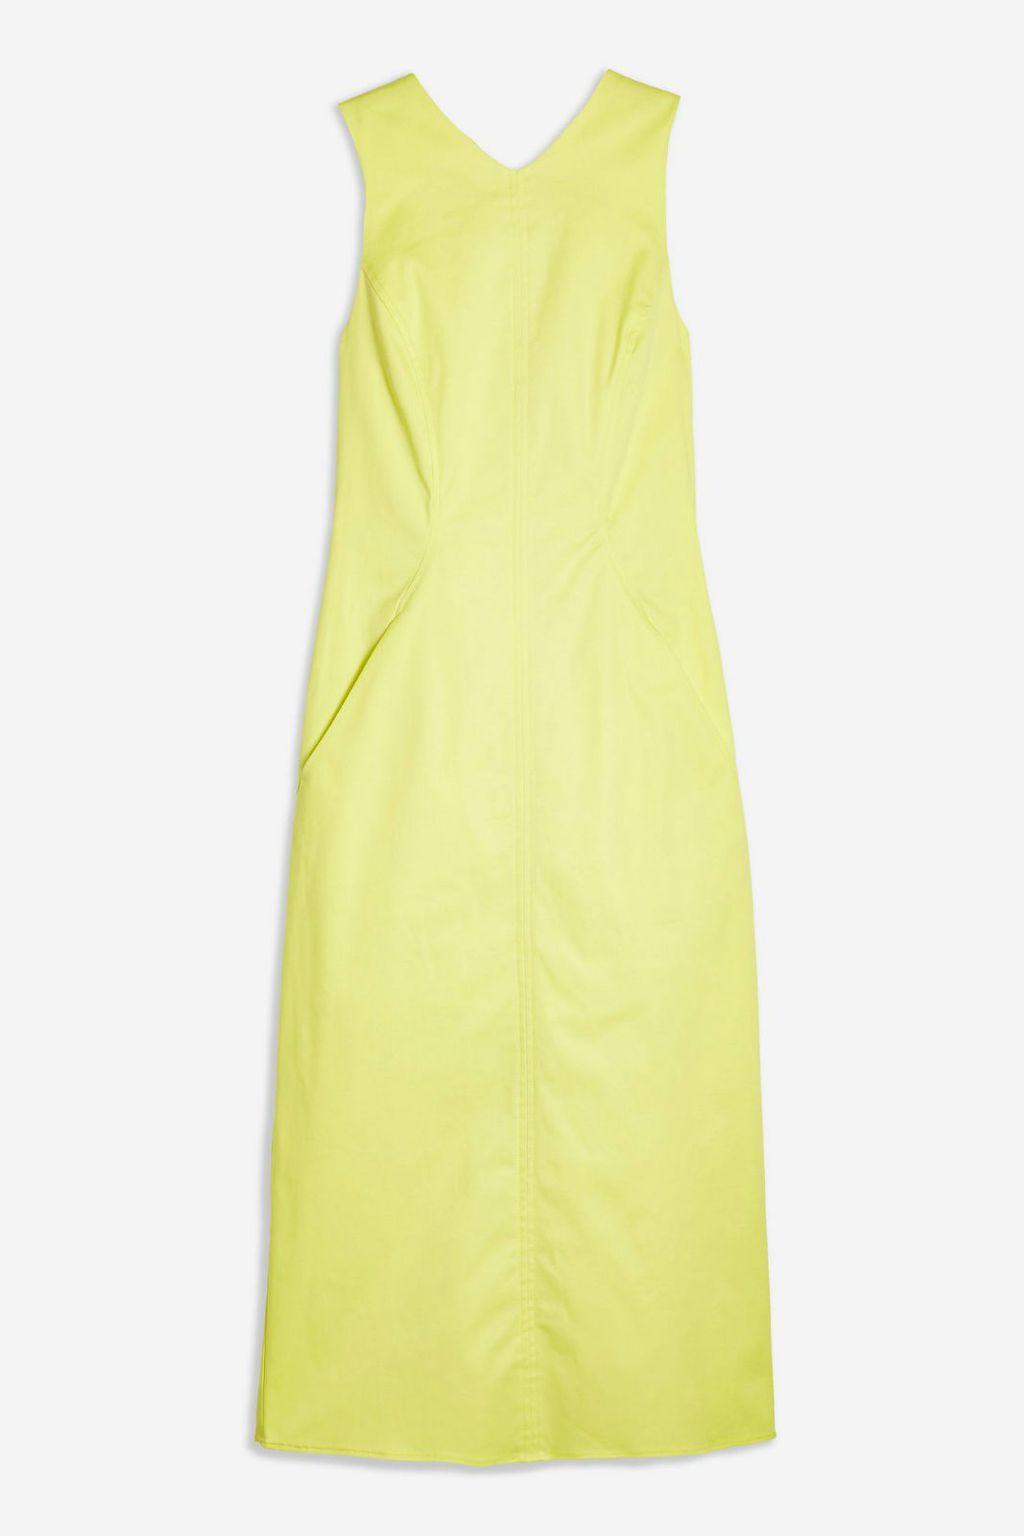 Topshop neonska haljina, 79 funti (670,47 kn)